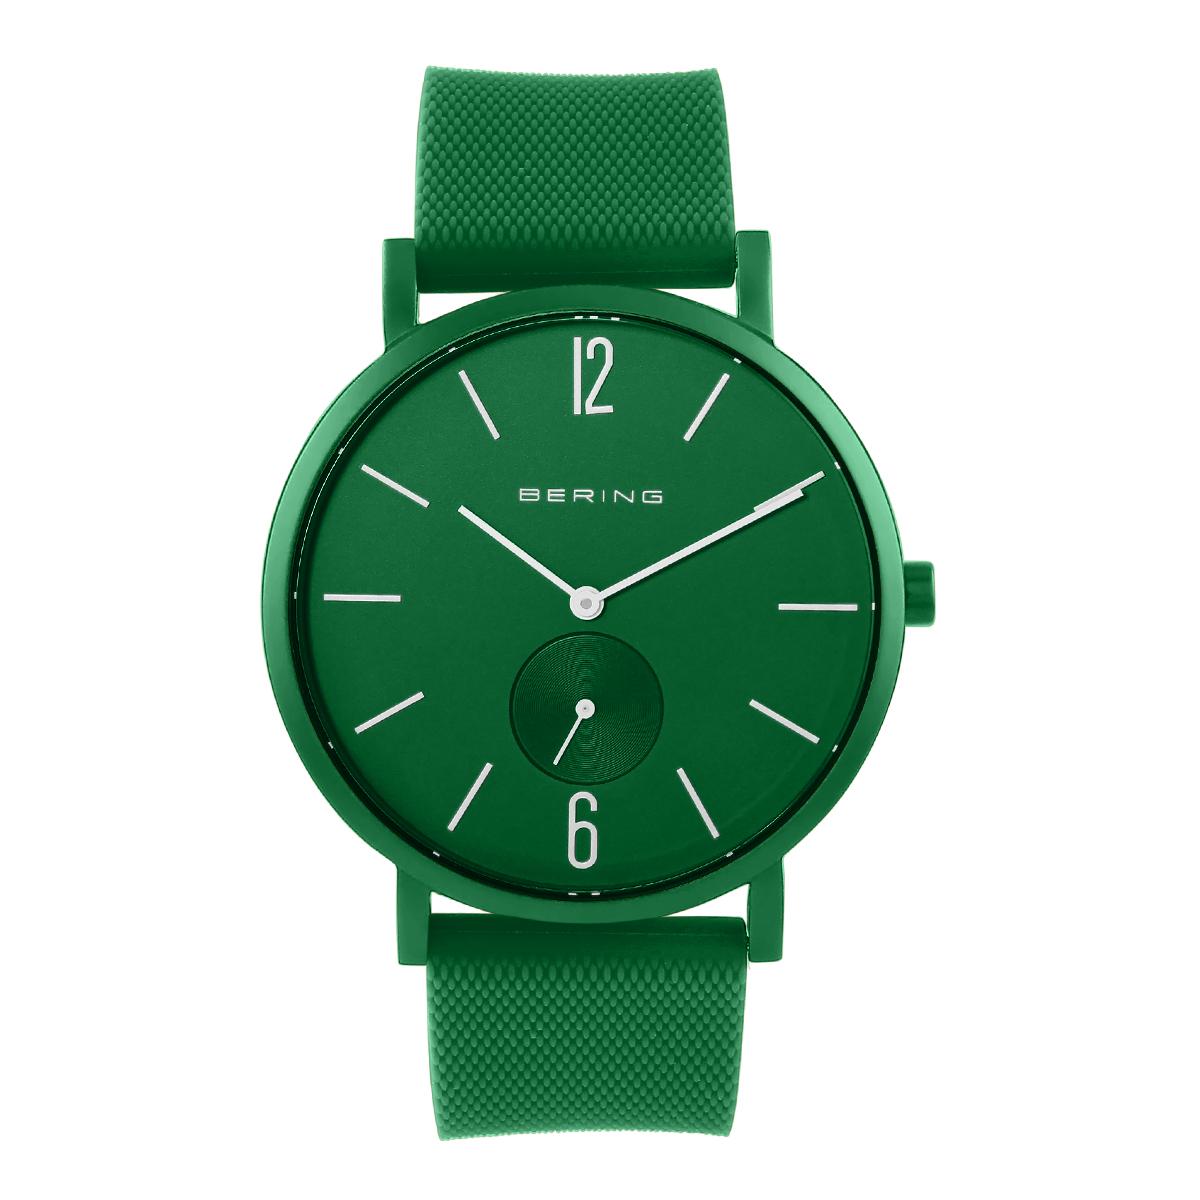 Bering Green Analogue Men's Watch – 16940-899